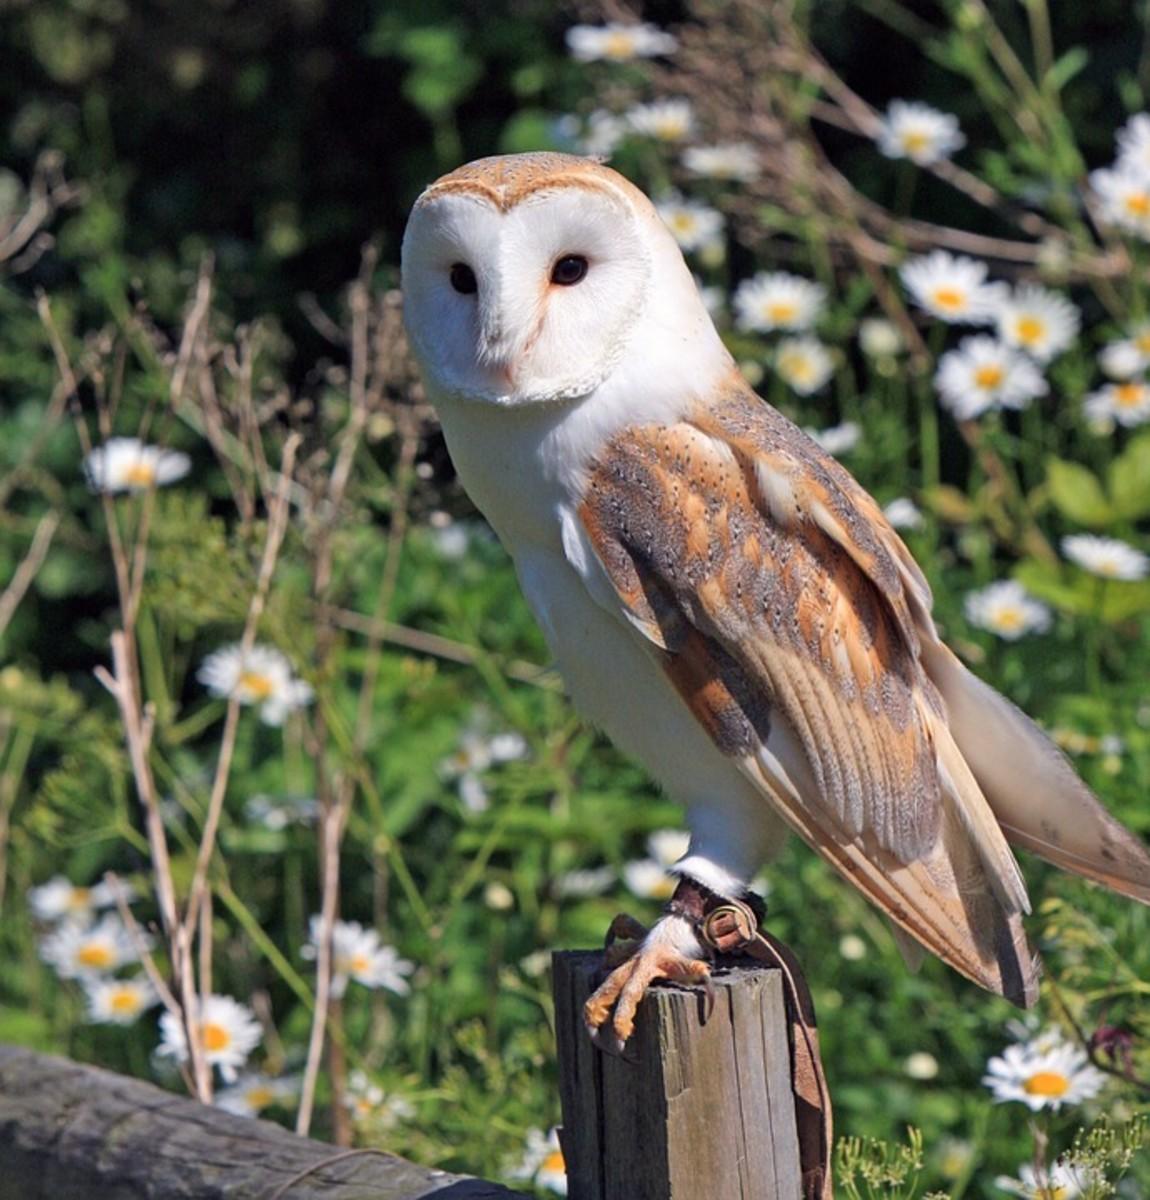 """""Hark! Peace! It was the owl that shrieked, the fatal bellman"" - Macbeth."